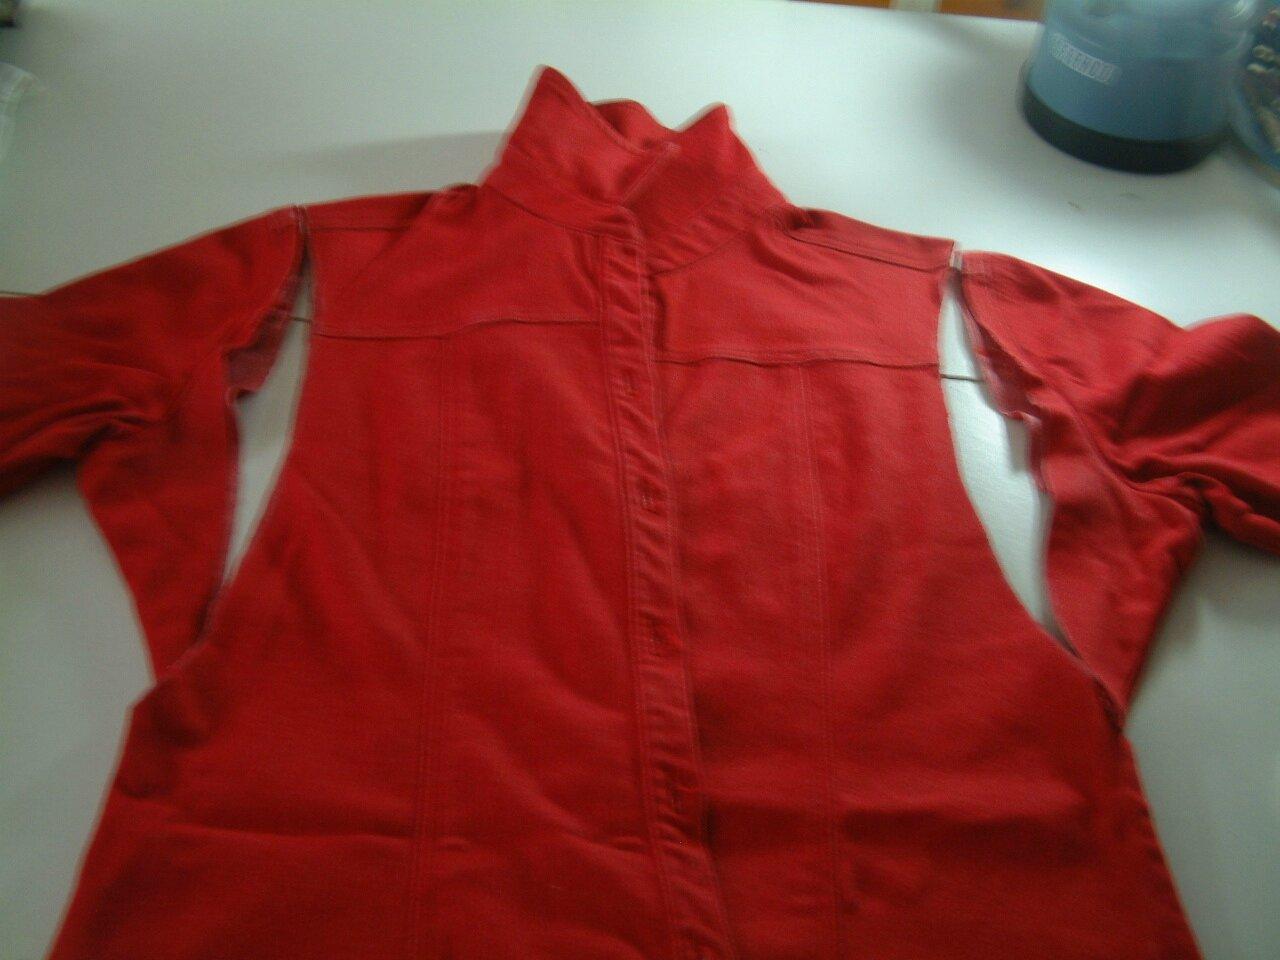 TUTO de ma petite robe rouge !!